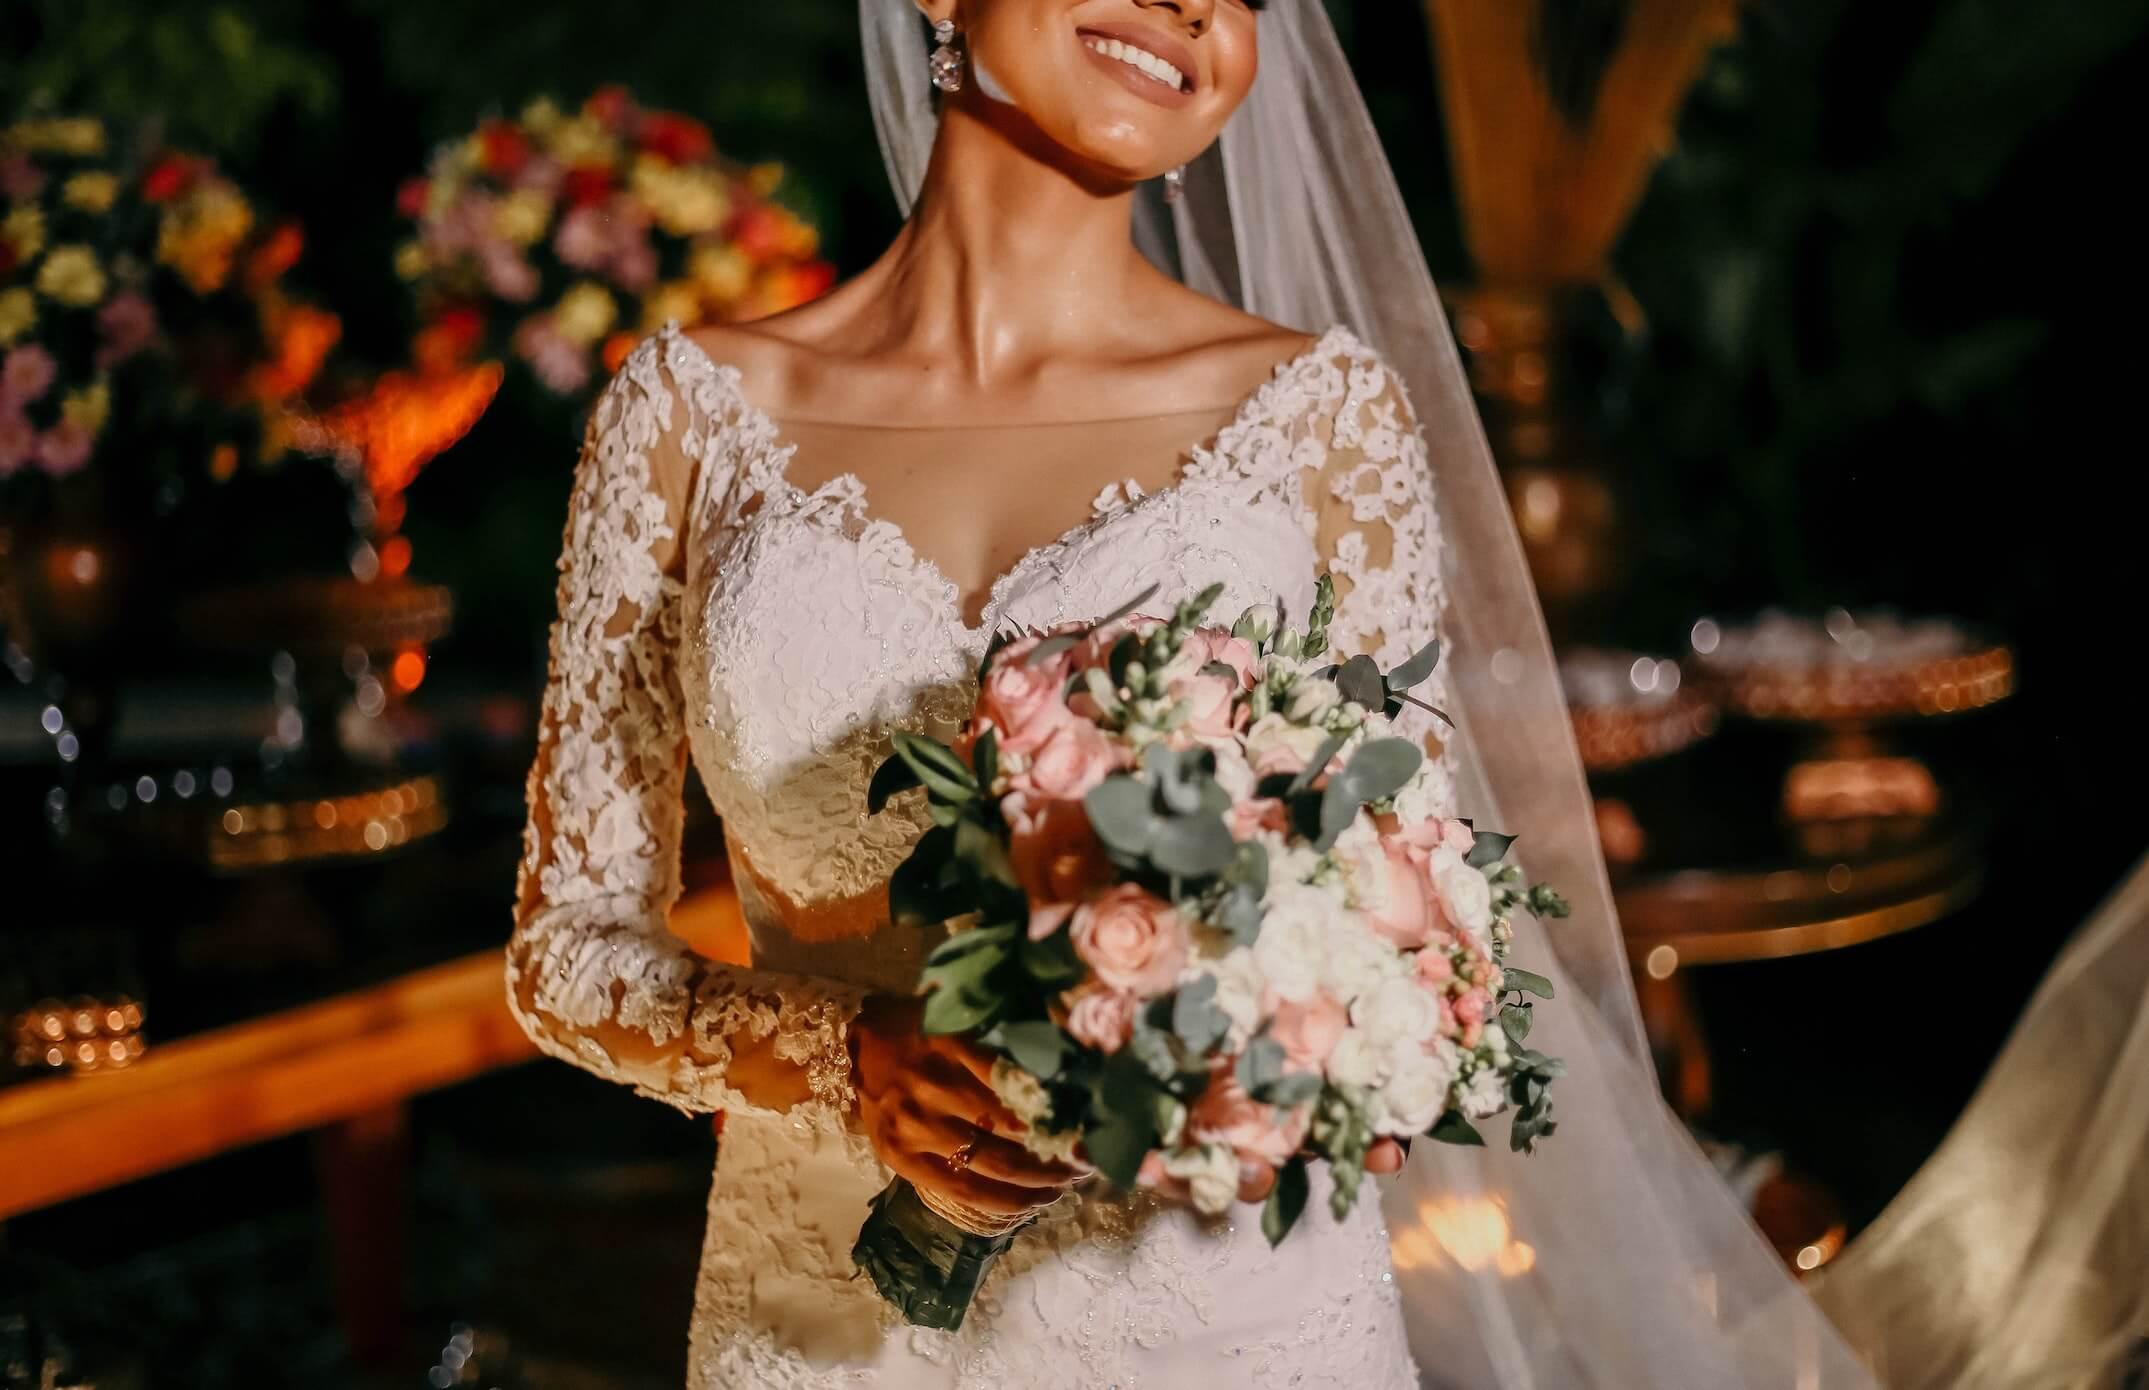 A bride walks into the wedding hall on her wedding day.